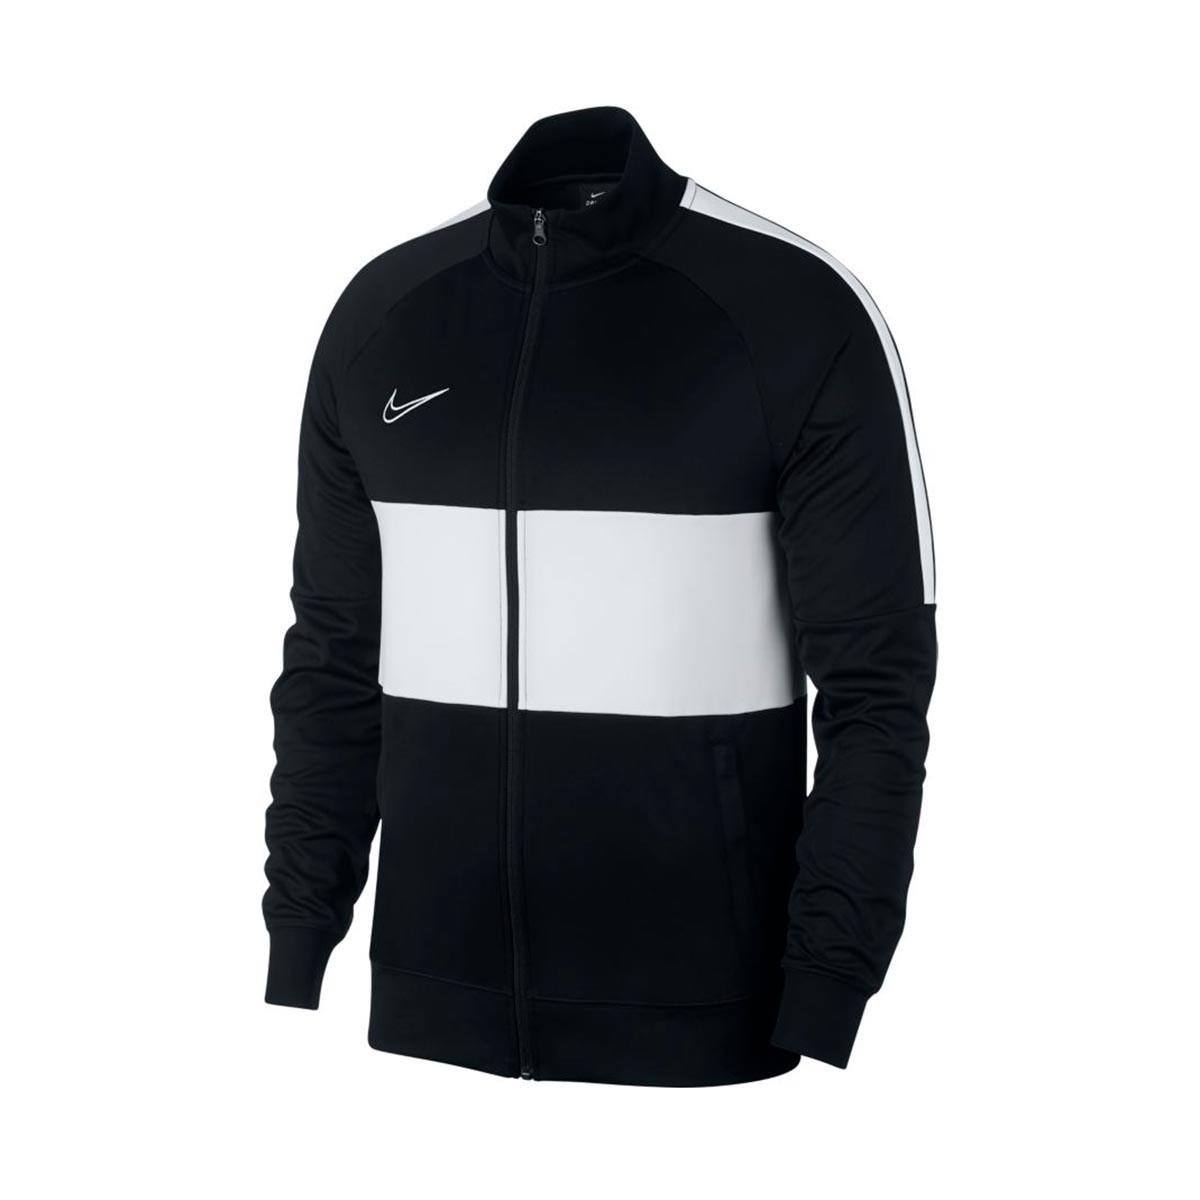 f09b6319b844 Jacket Nike Dri-FIT Academy Black-White - Football store Fútbol Emotion